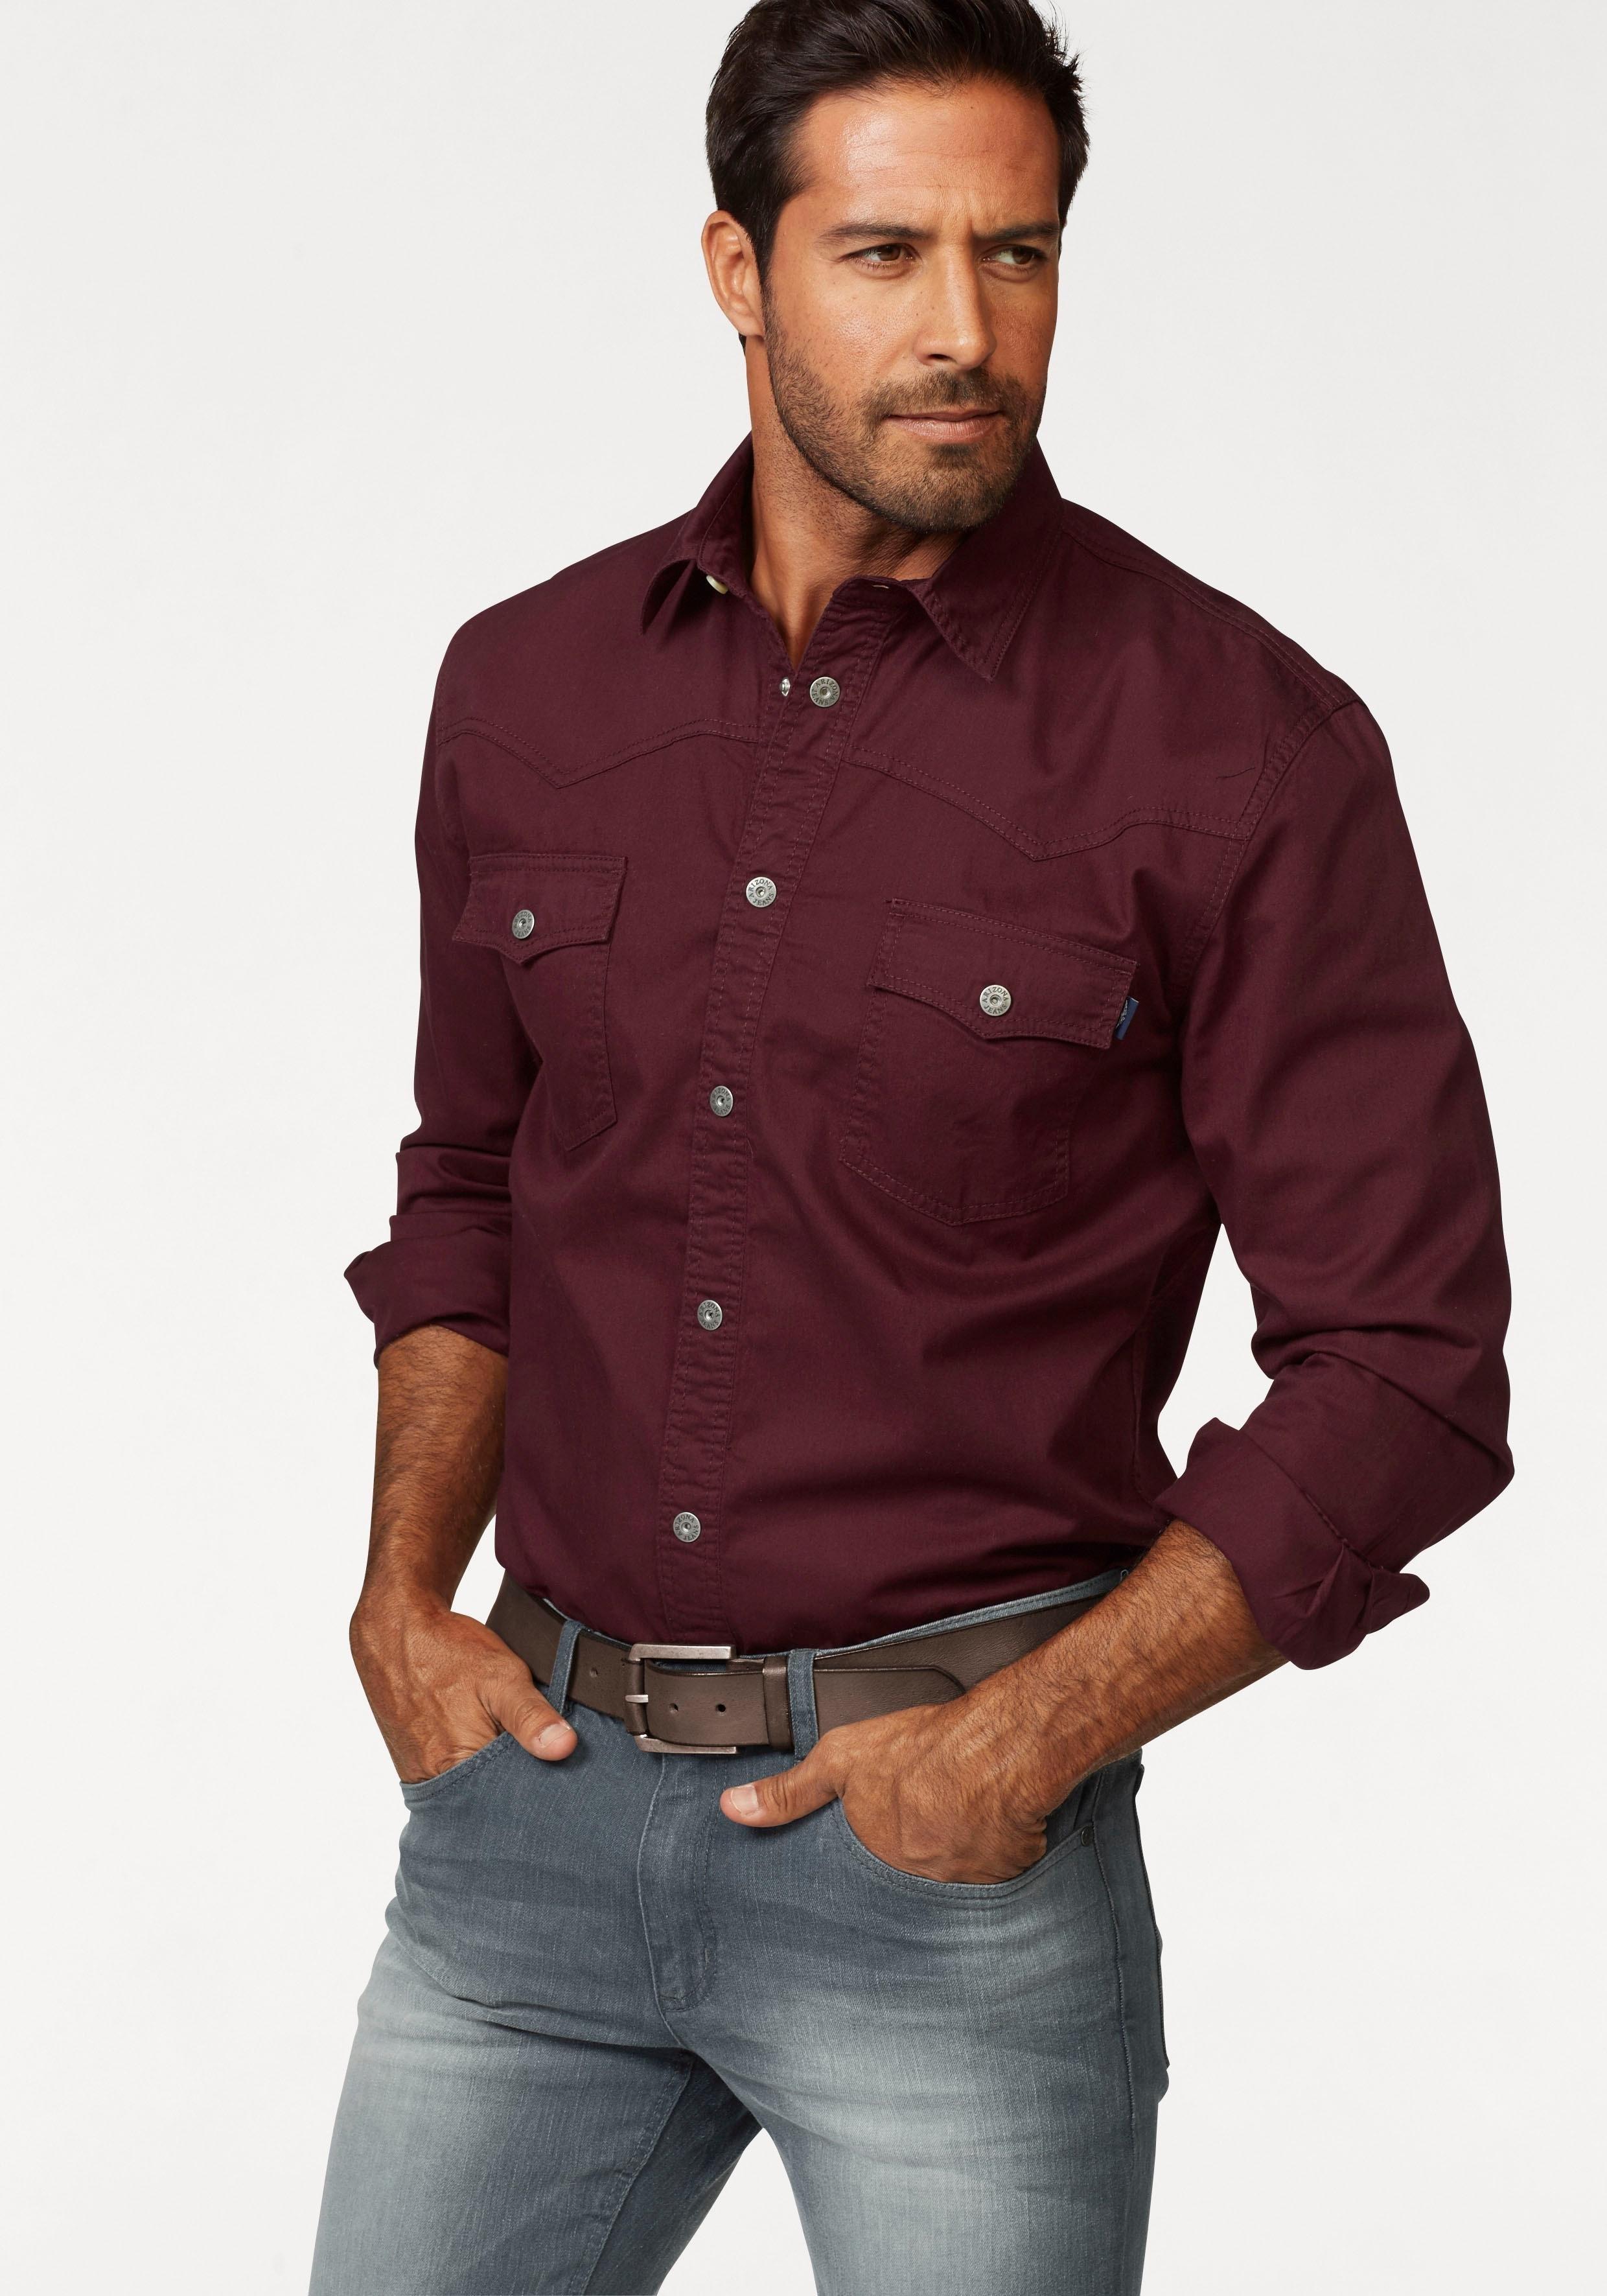 Overhemd Mannen.Overhemden Online Kopen Grote Collectie Otto